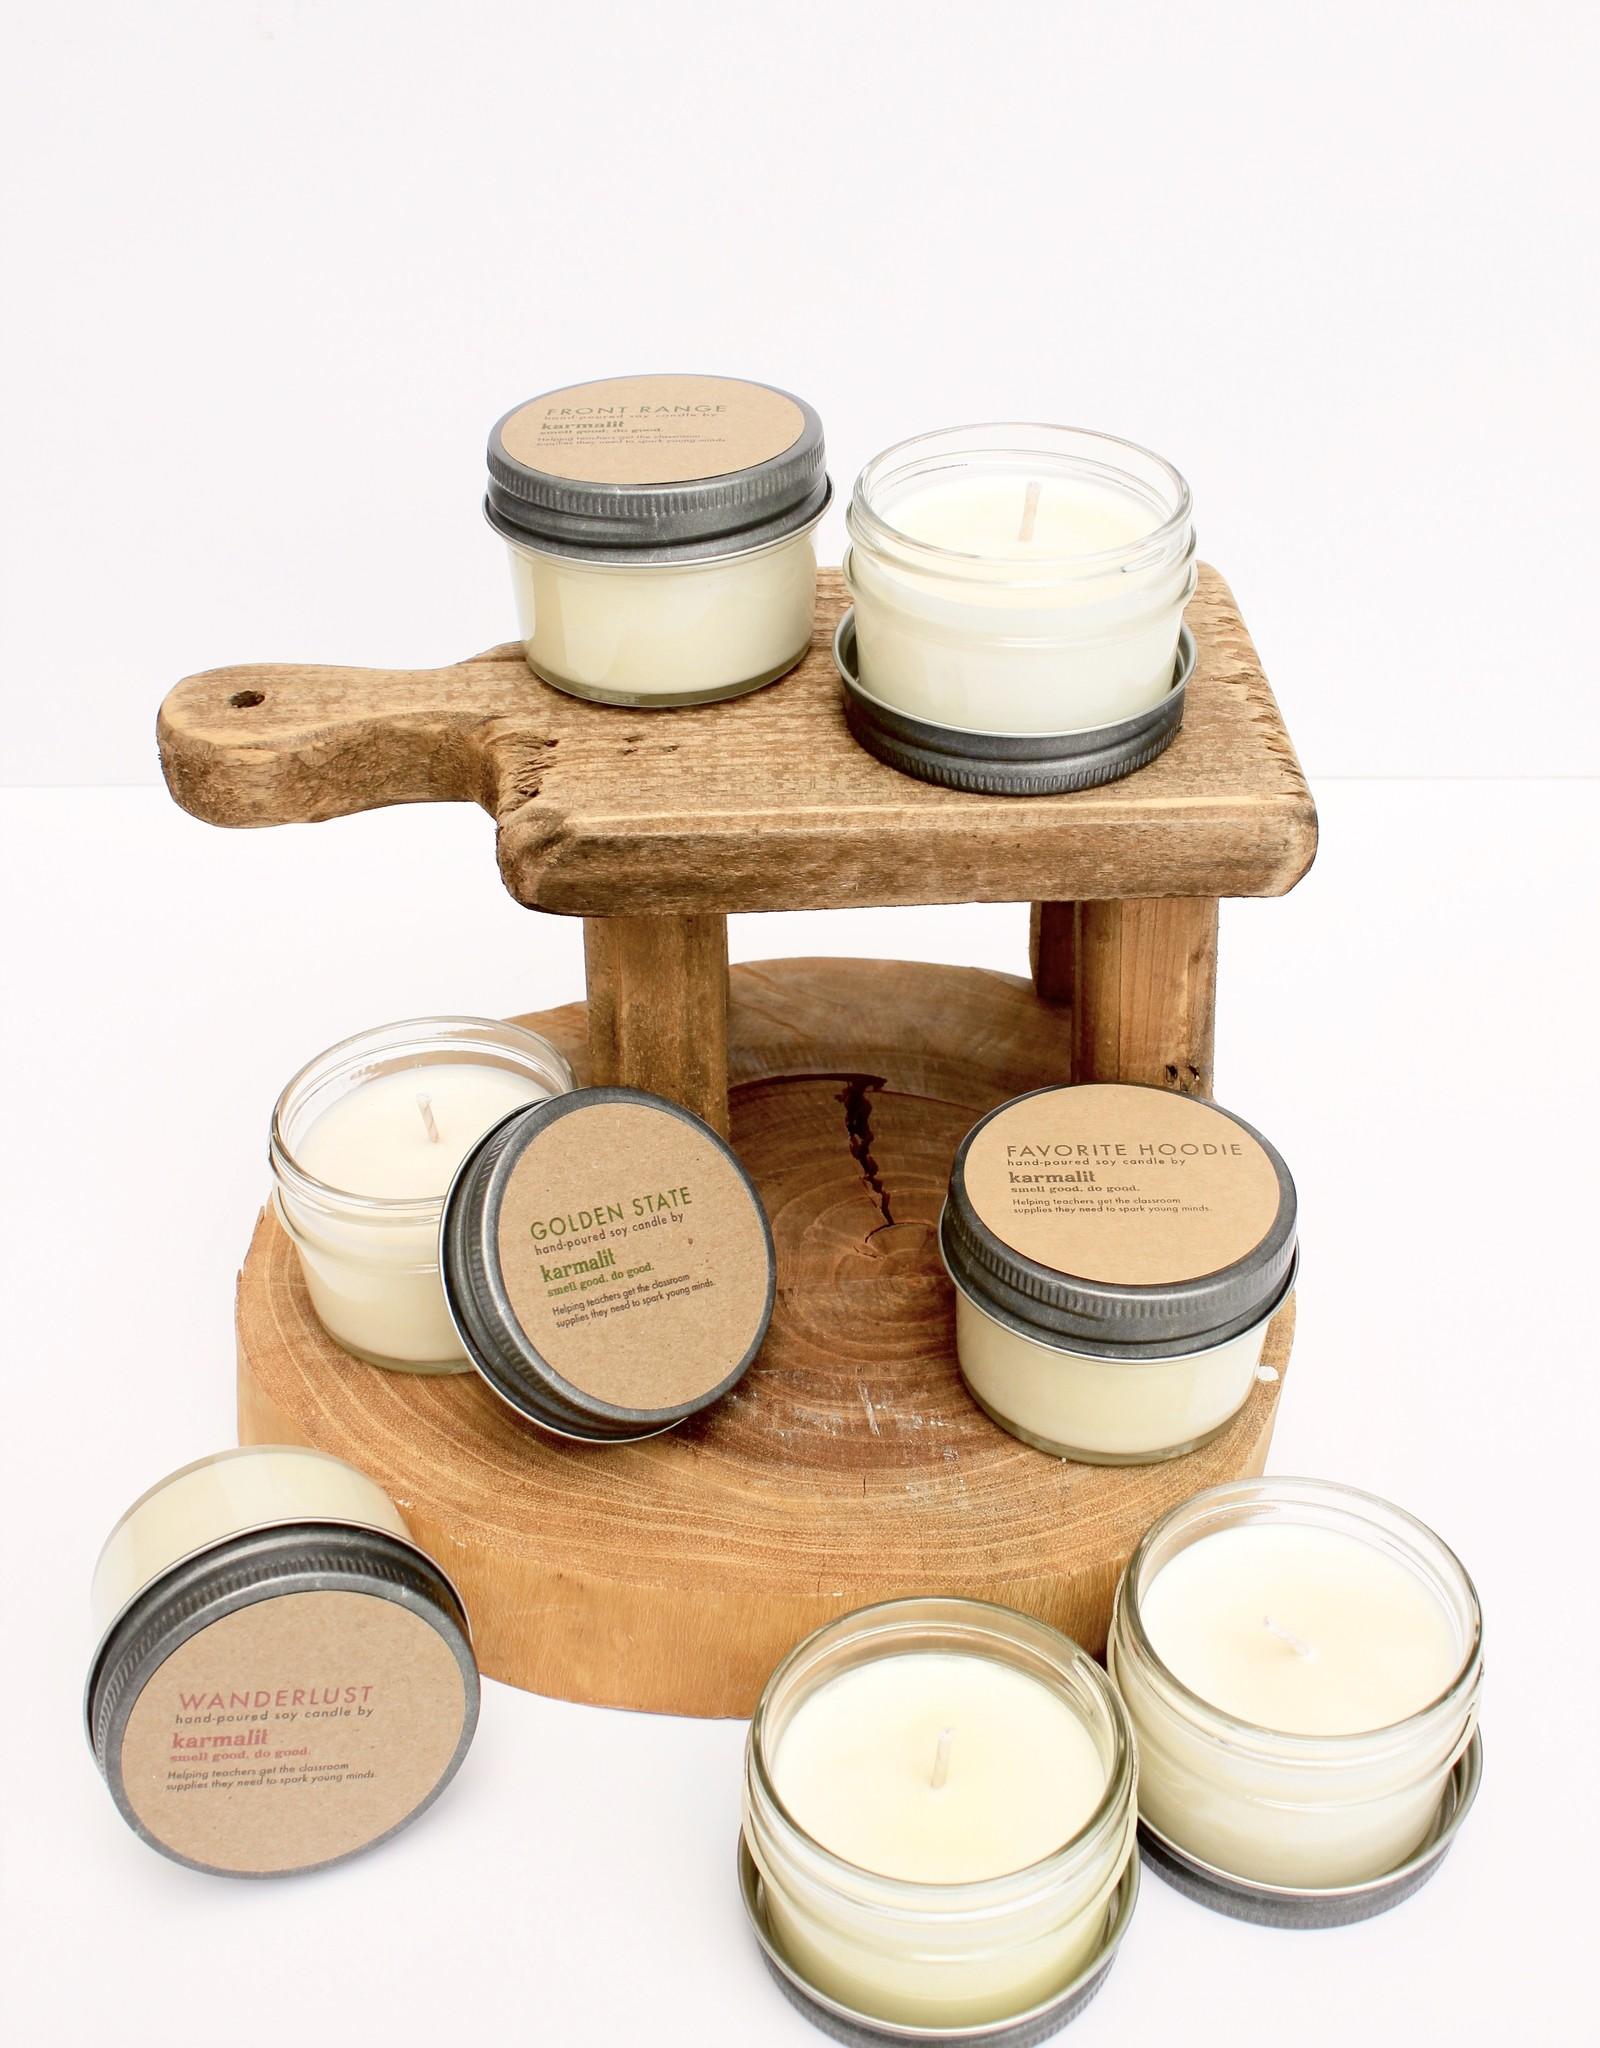 Karmalit Candles